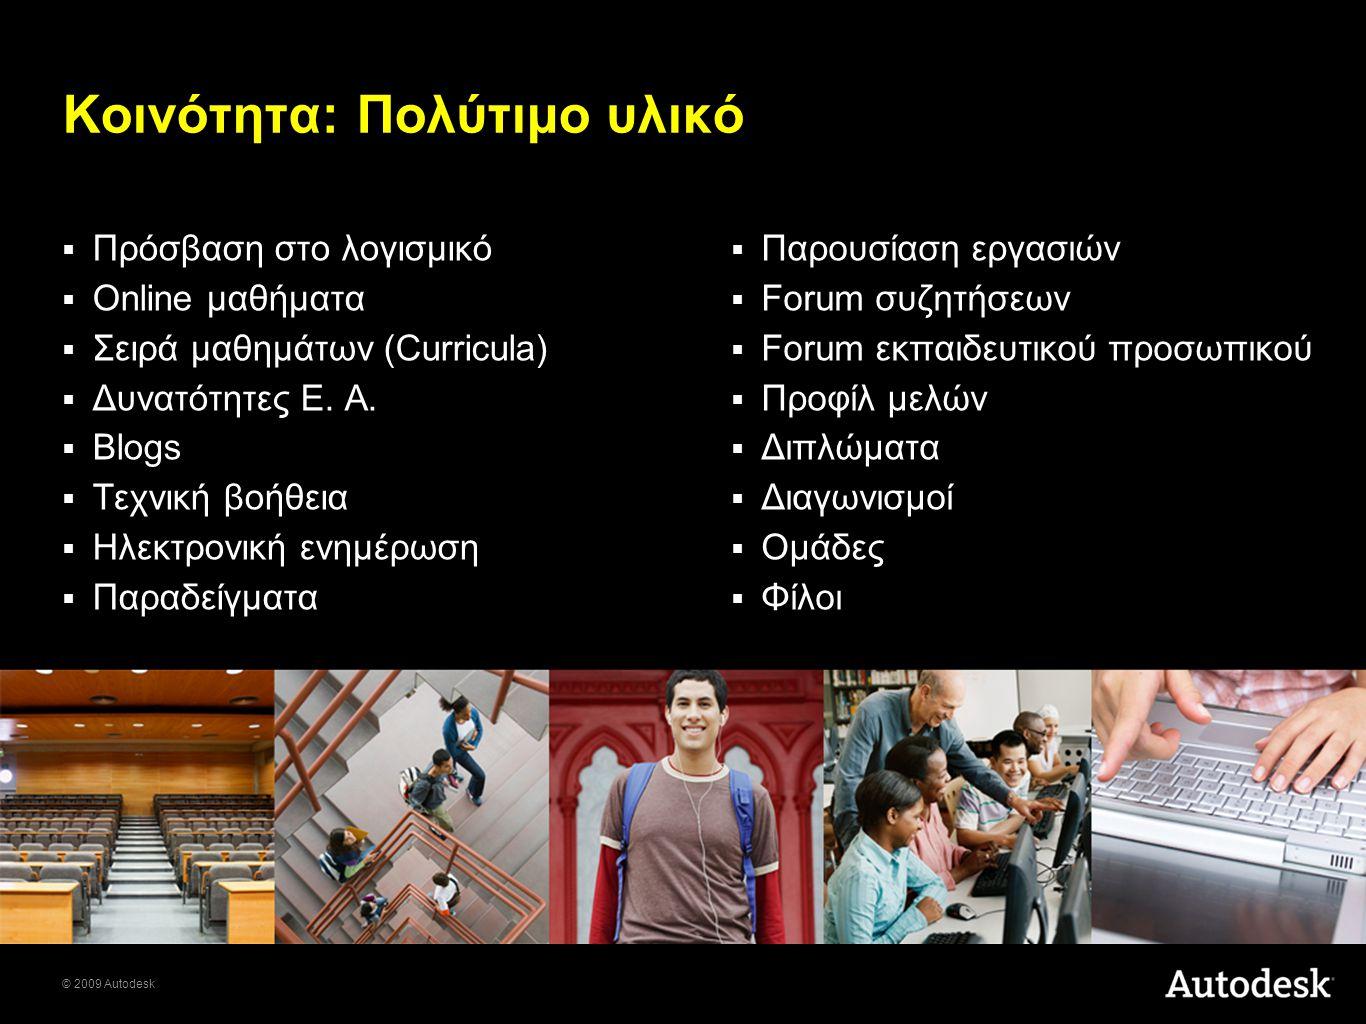 © 2009 Autodesk Κοινότητα: Πολύτιμο υλικό  Πρόσβαση στο λογισμικό  Online μαθήματα  Σειρά μαθημάτων (Curricula)  Δυνατότητες Ε.